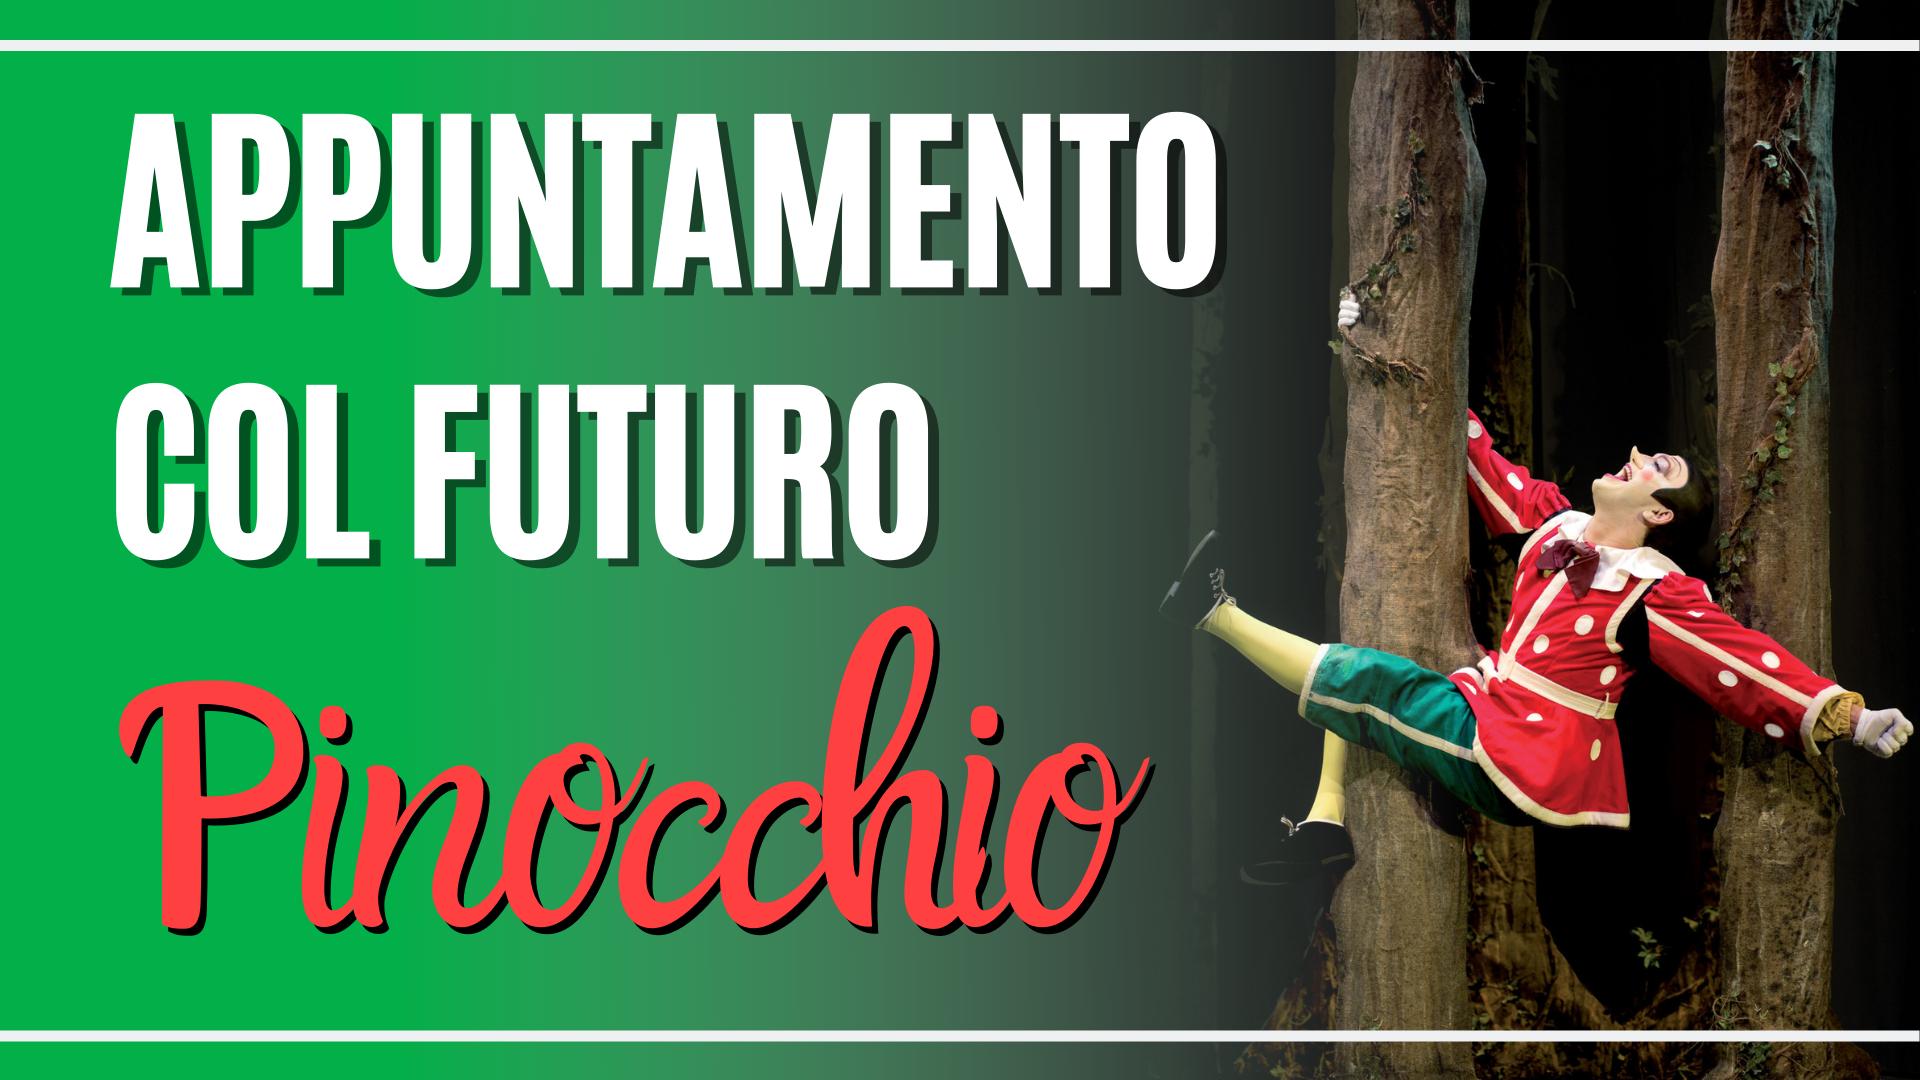 Immagine ACF Pinocchio -